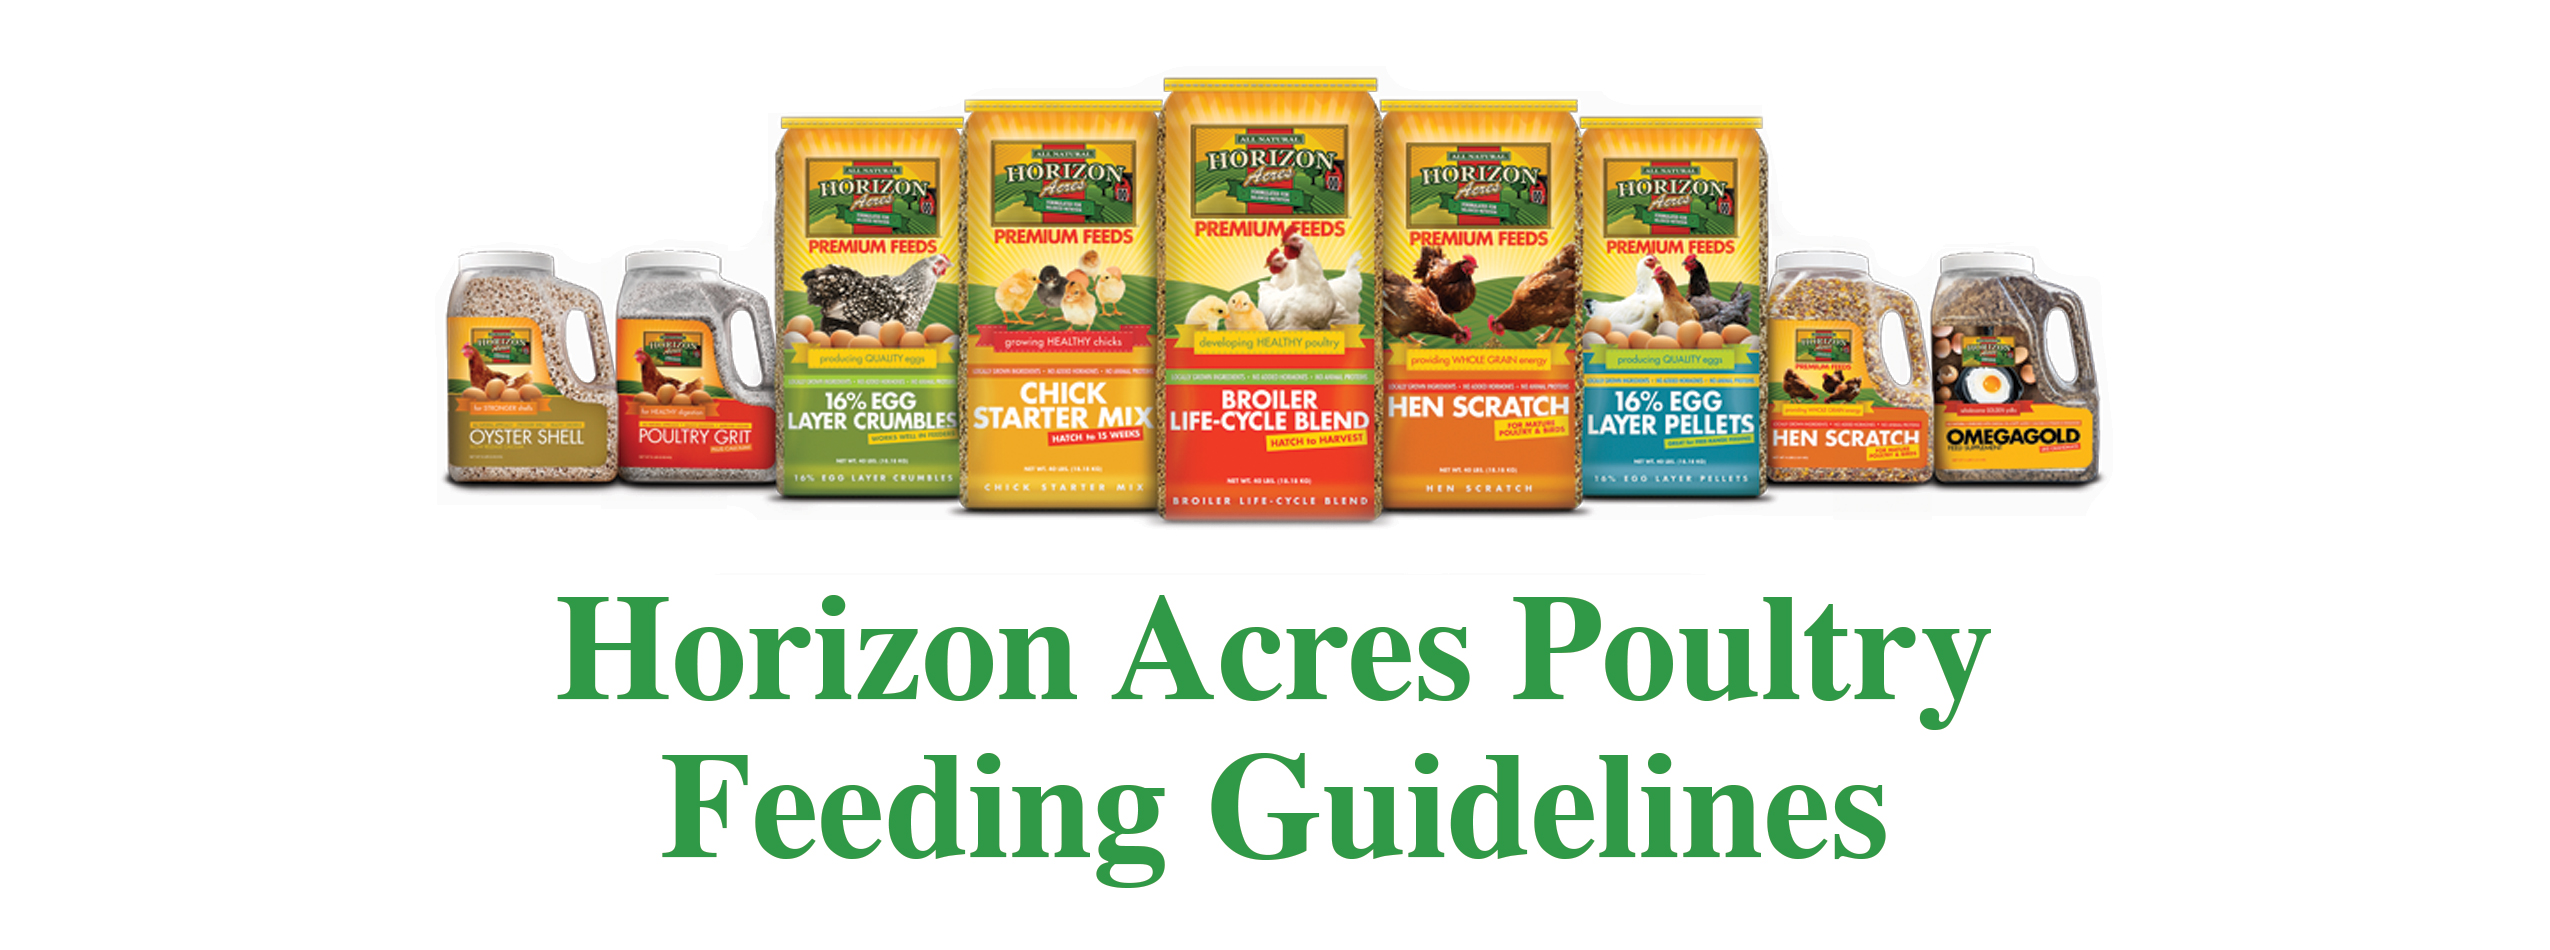 Horizon Acres Poultry Feeding Guidelines